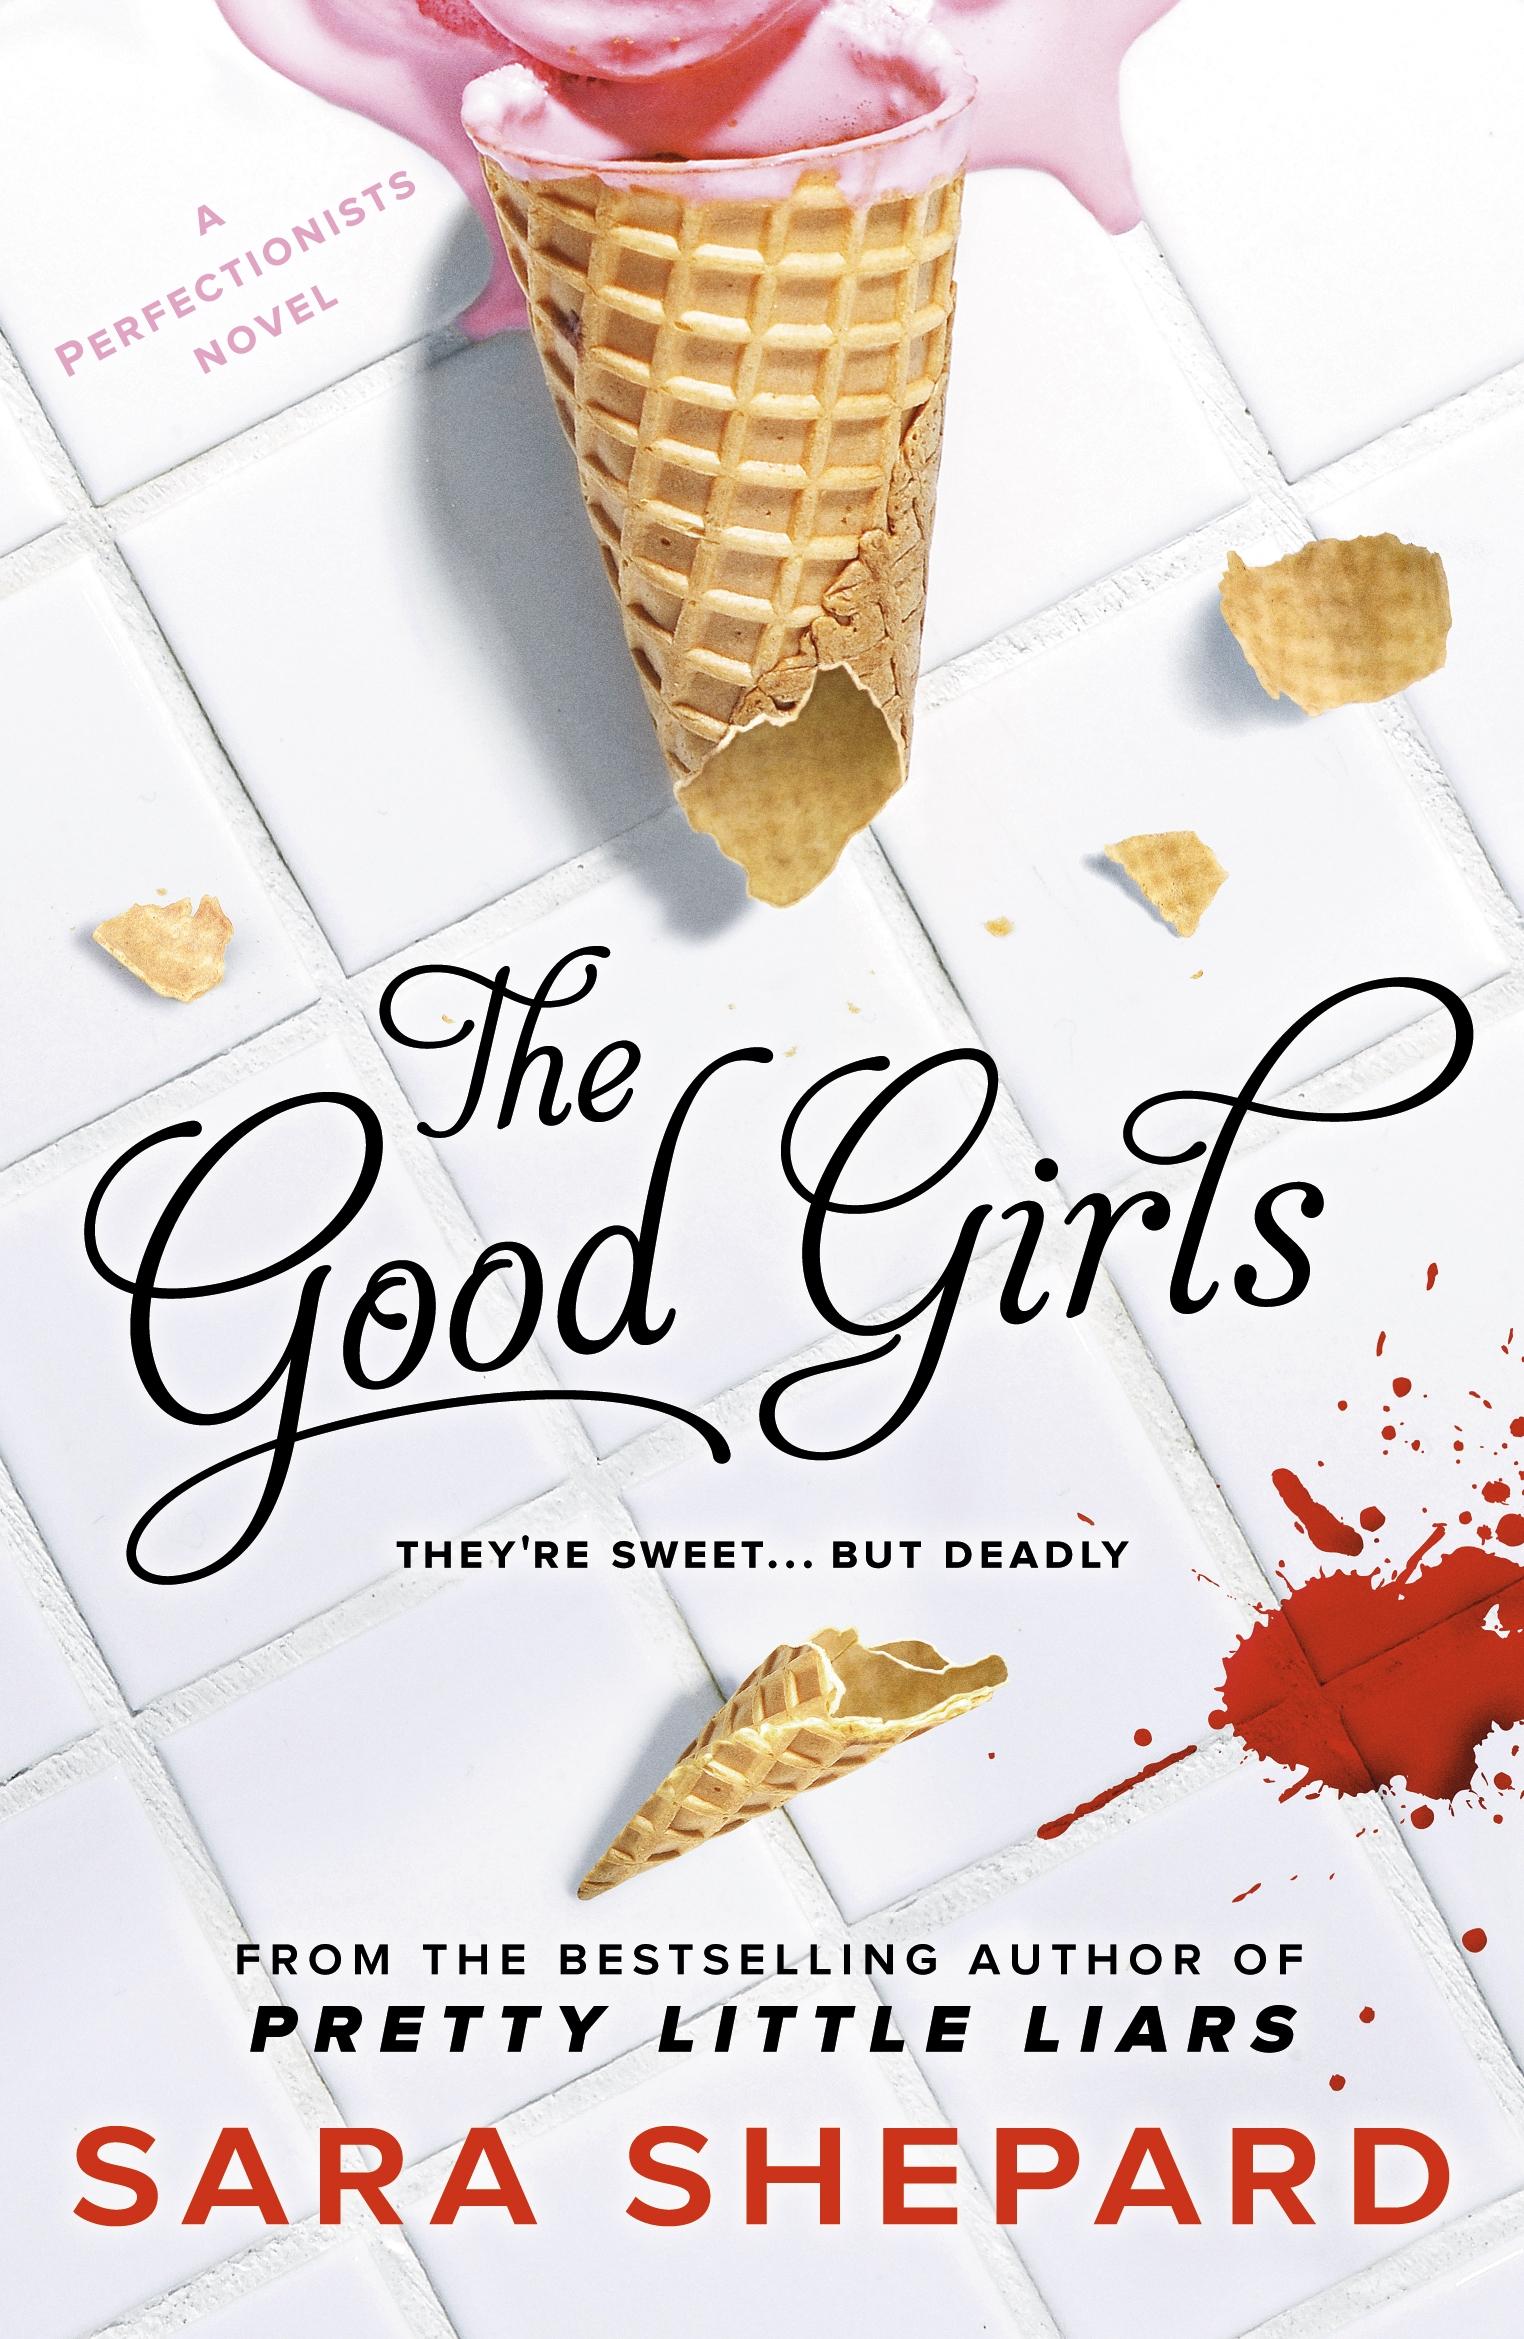 The Good Girls by Sara Shepard